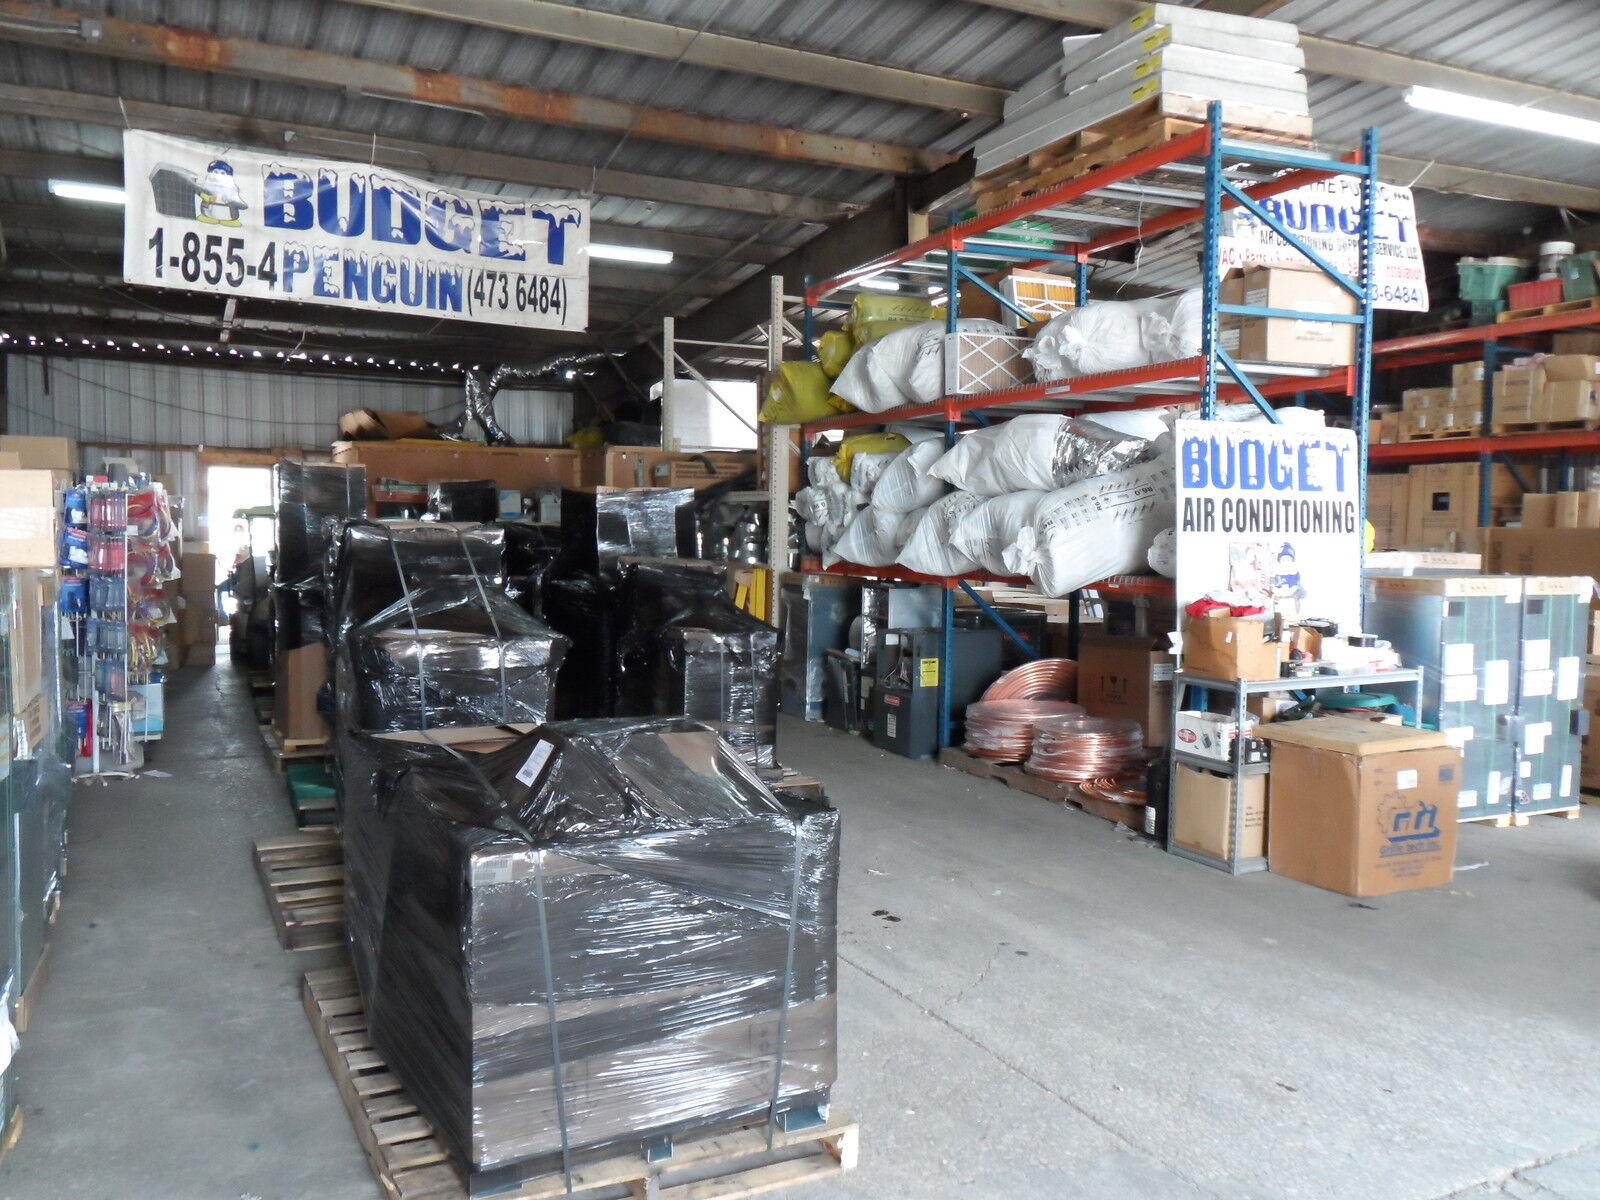 goodman 3 5 ton heat pump. picture 3 of 9 goodman 5 ton heat pump